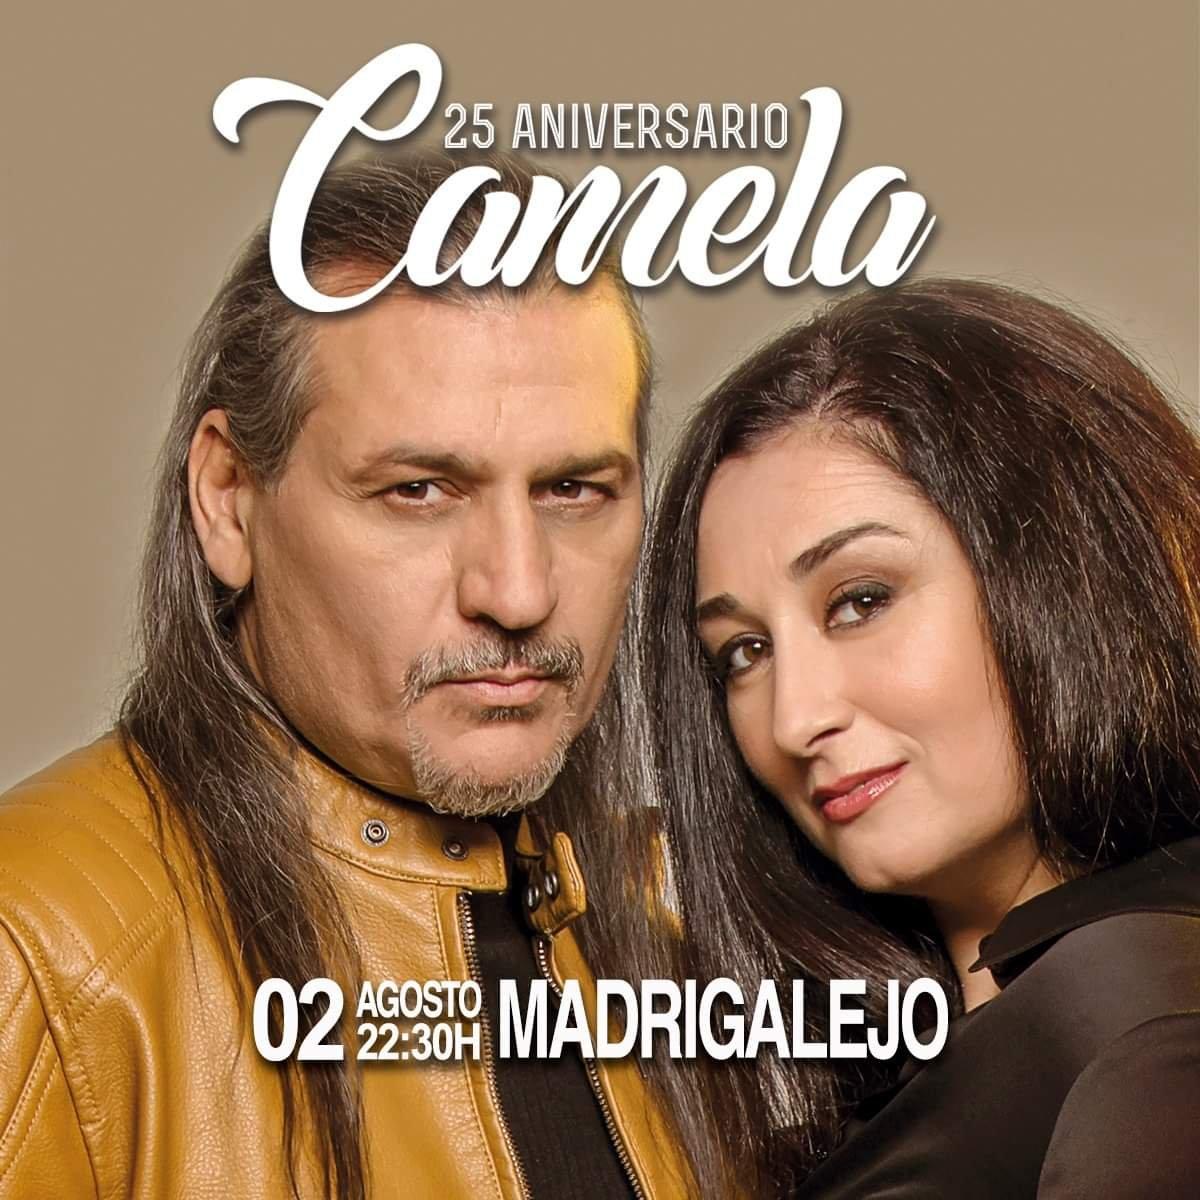 Camela 2019 - Madrigalejo (Cáceres)